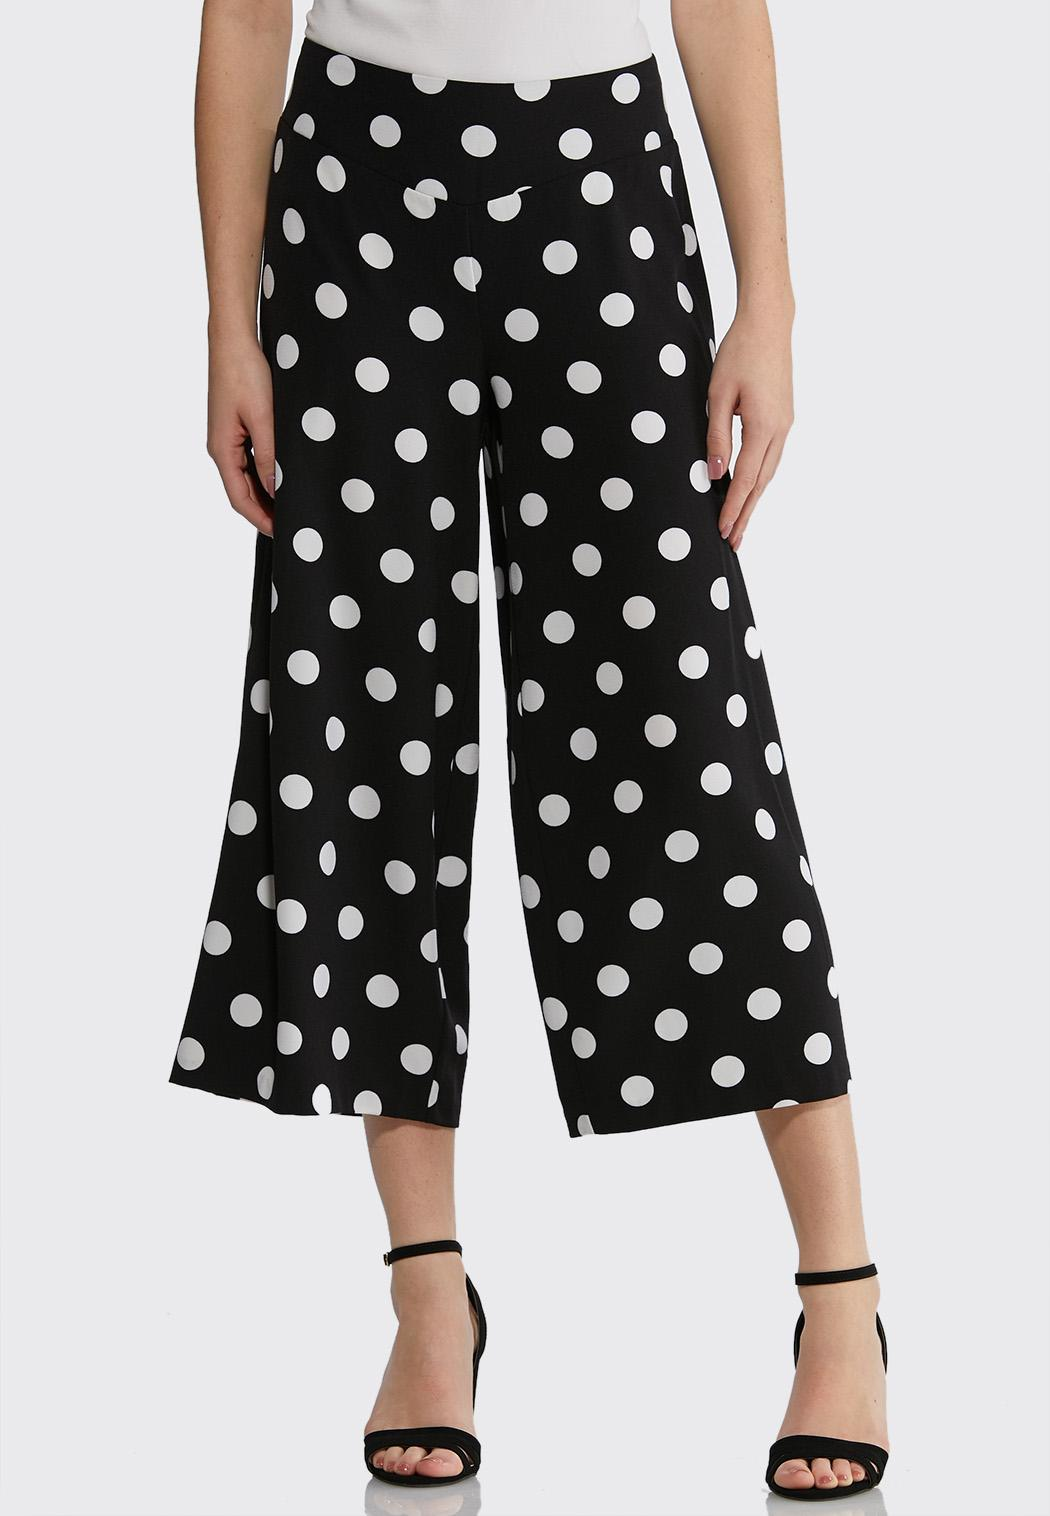 Cropped Polka Dot Pants